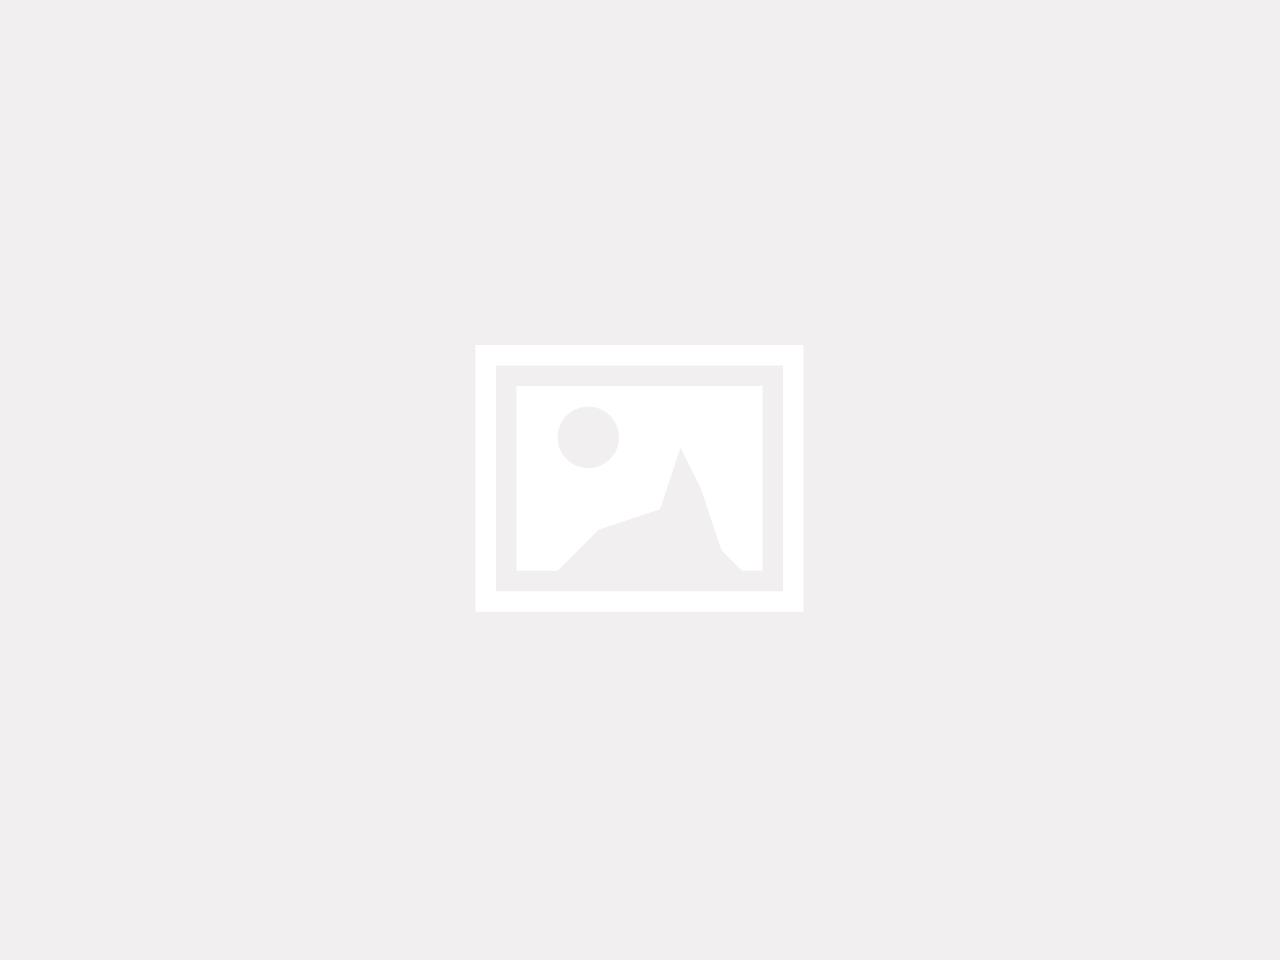 placeholder-image